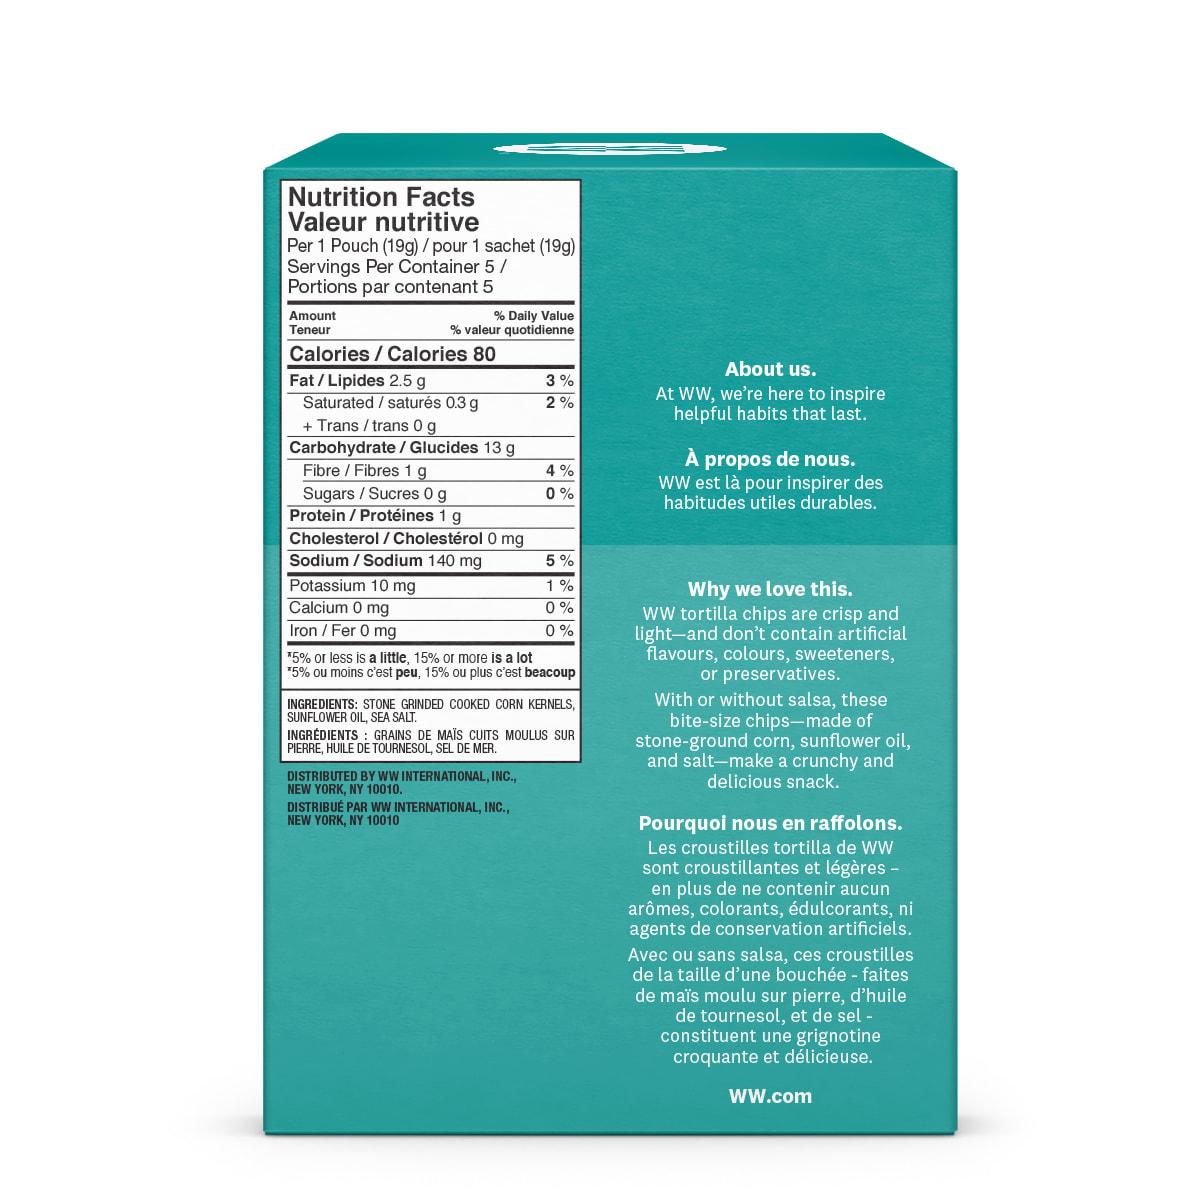 Sea Salt Tortilla Chips - side 2 of the box